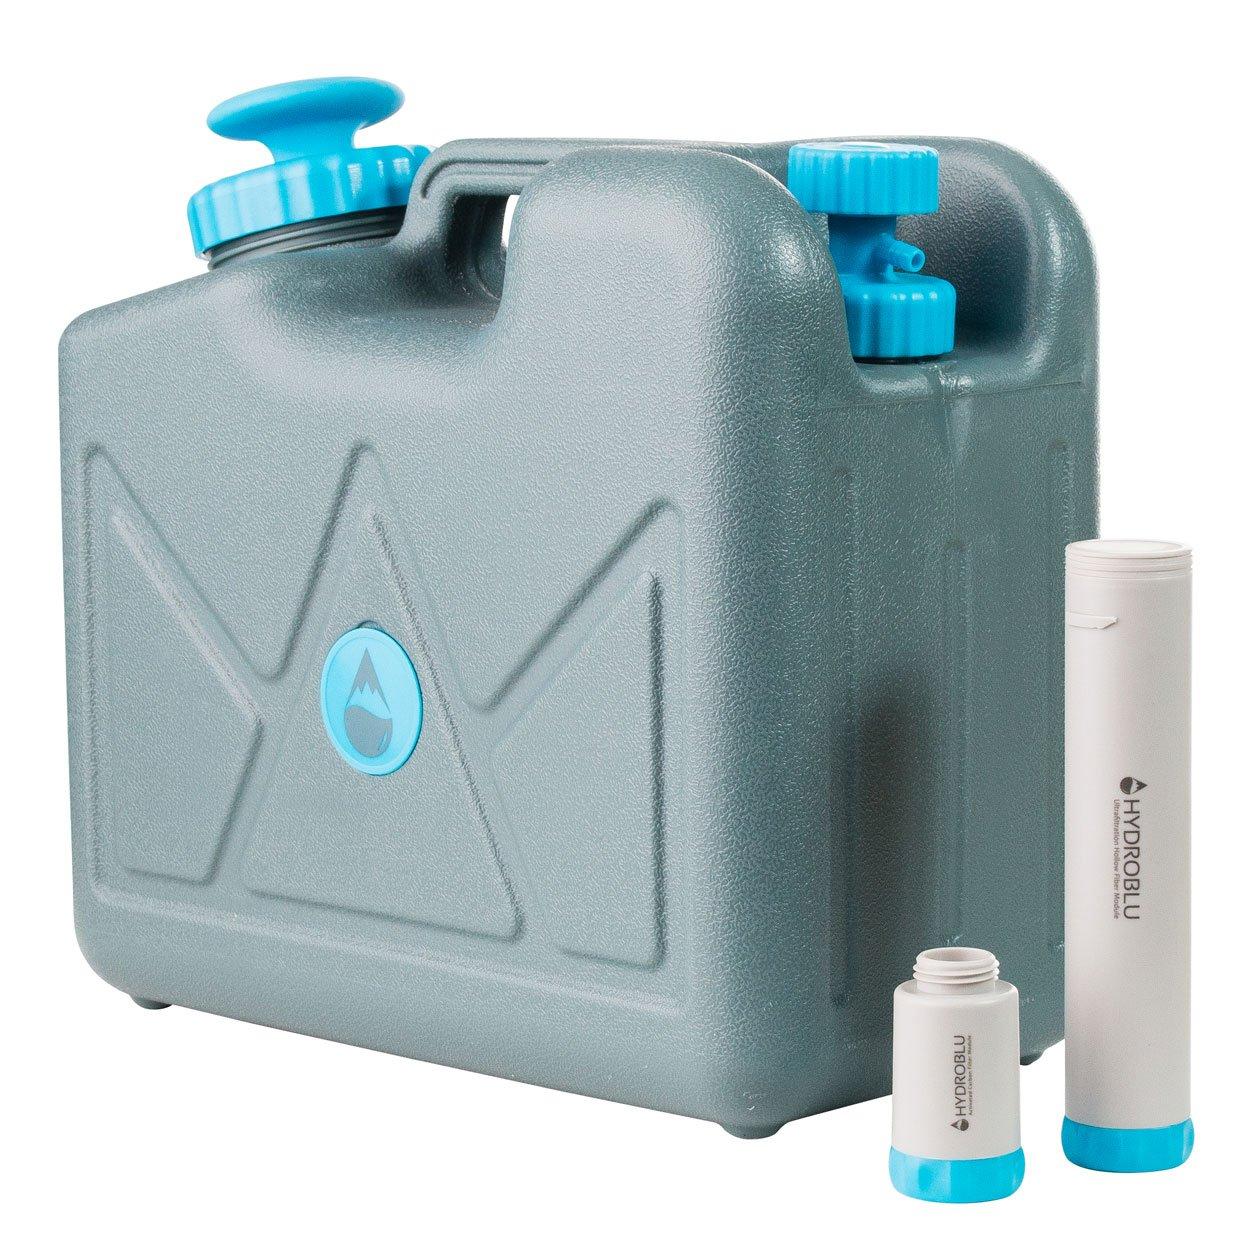 HydroBlu Pressurized Jerry Can Water Filter by HydroBlu